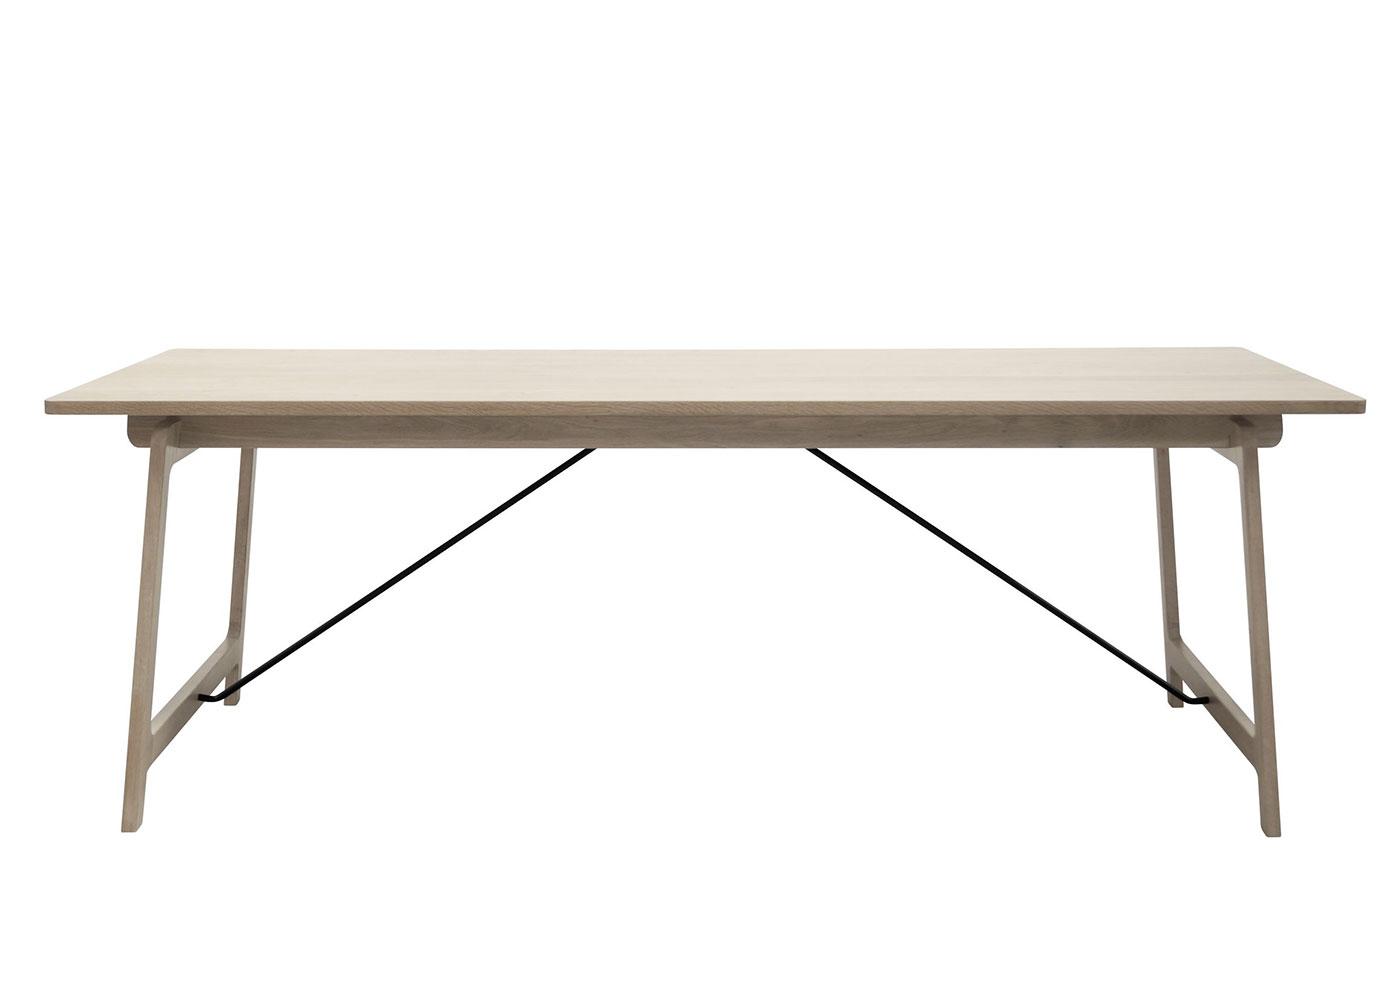 Jedálenský stôl Kerstin, 220 cm, dub, dub